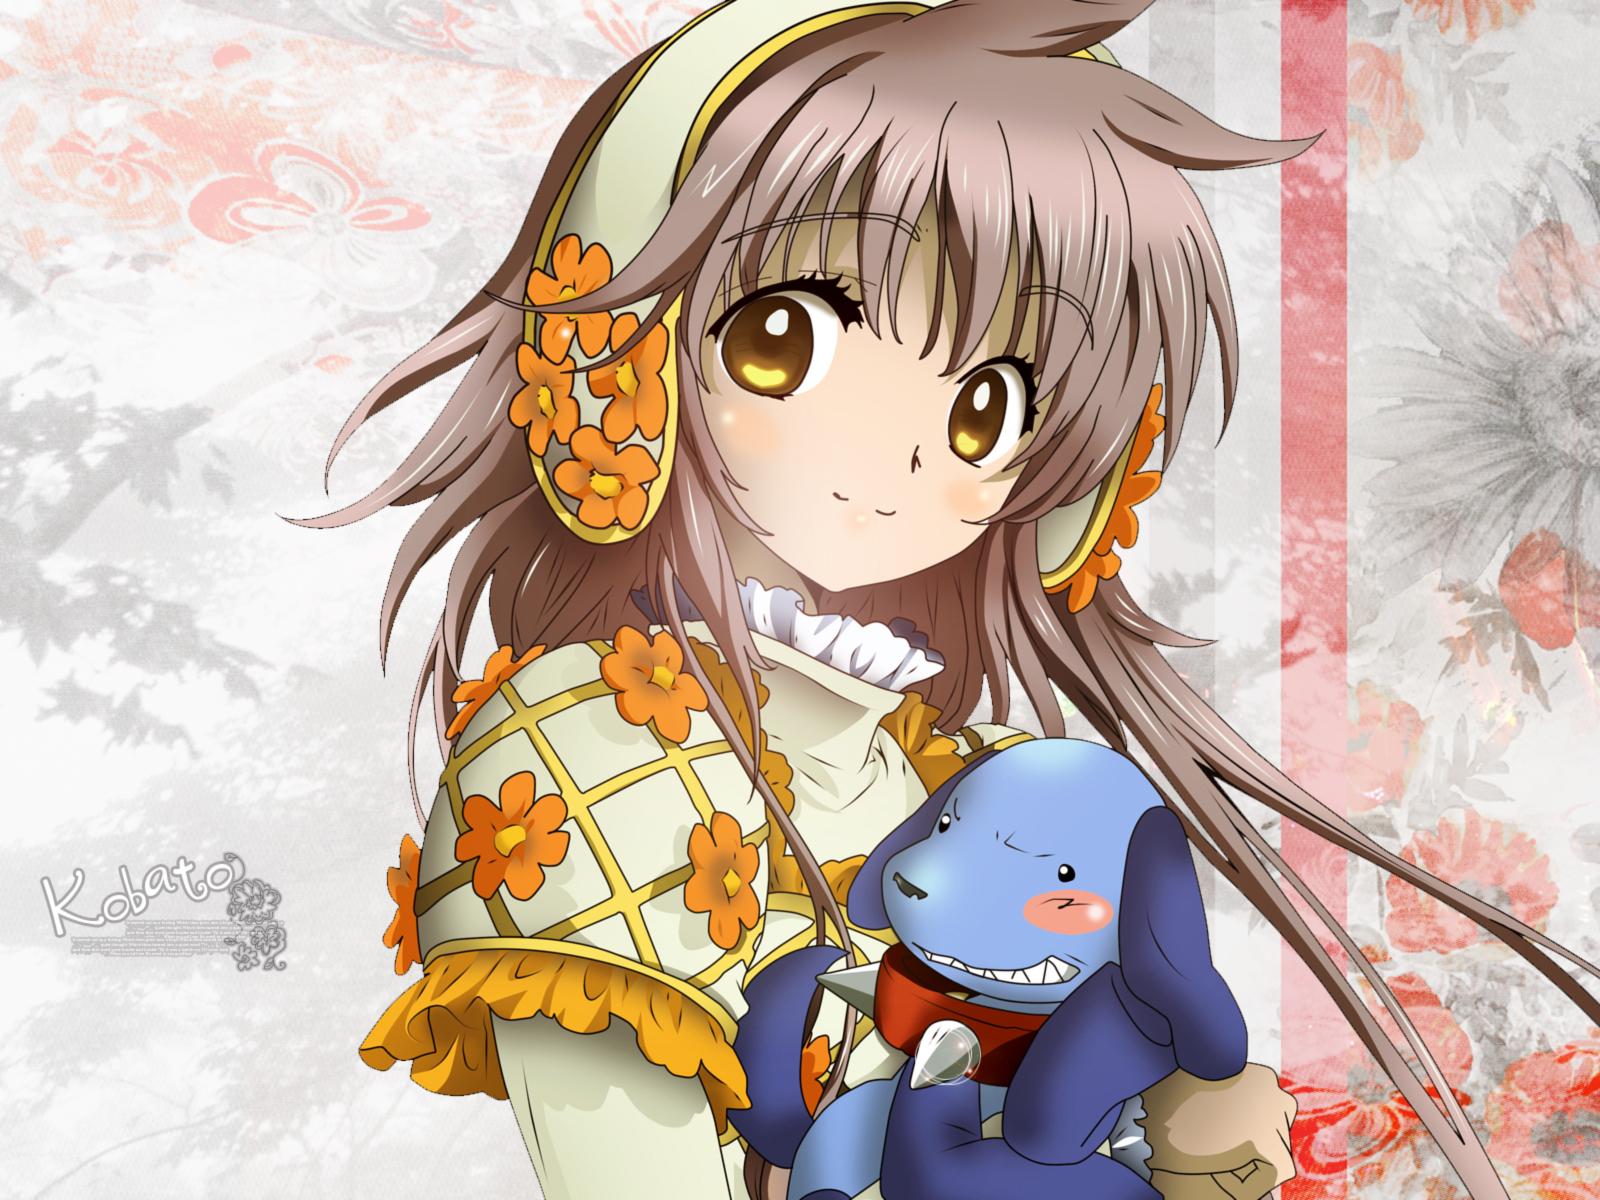 Kobato wallpaper zerochan anime image board for Zerochan anime